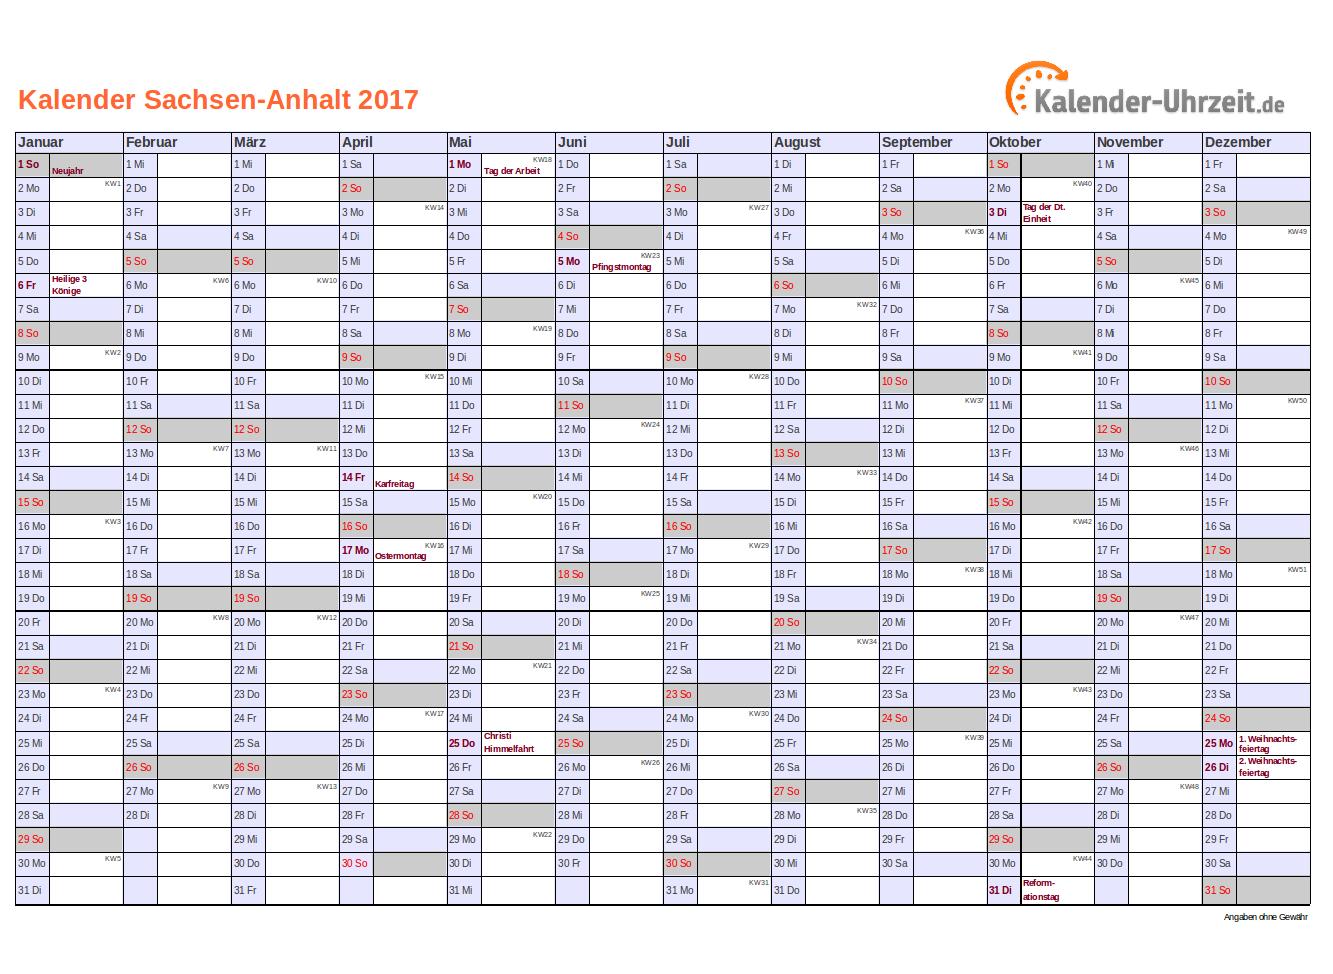 Sachsen-Anhalt Kalender 2017